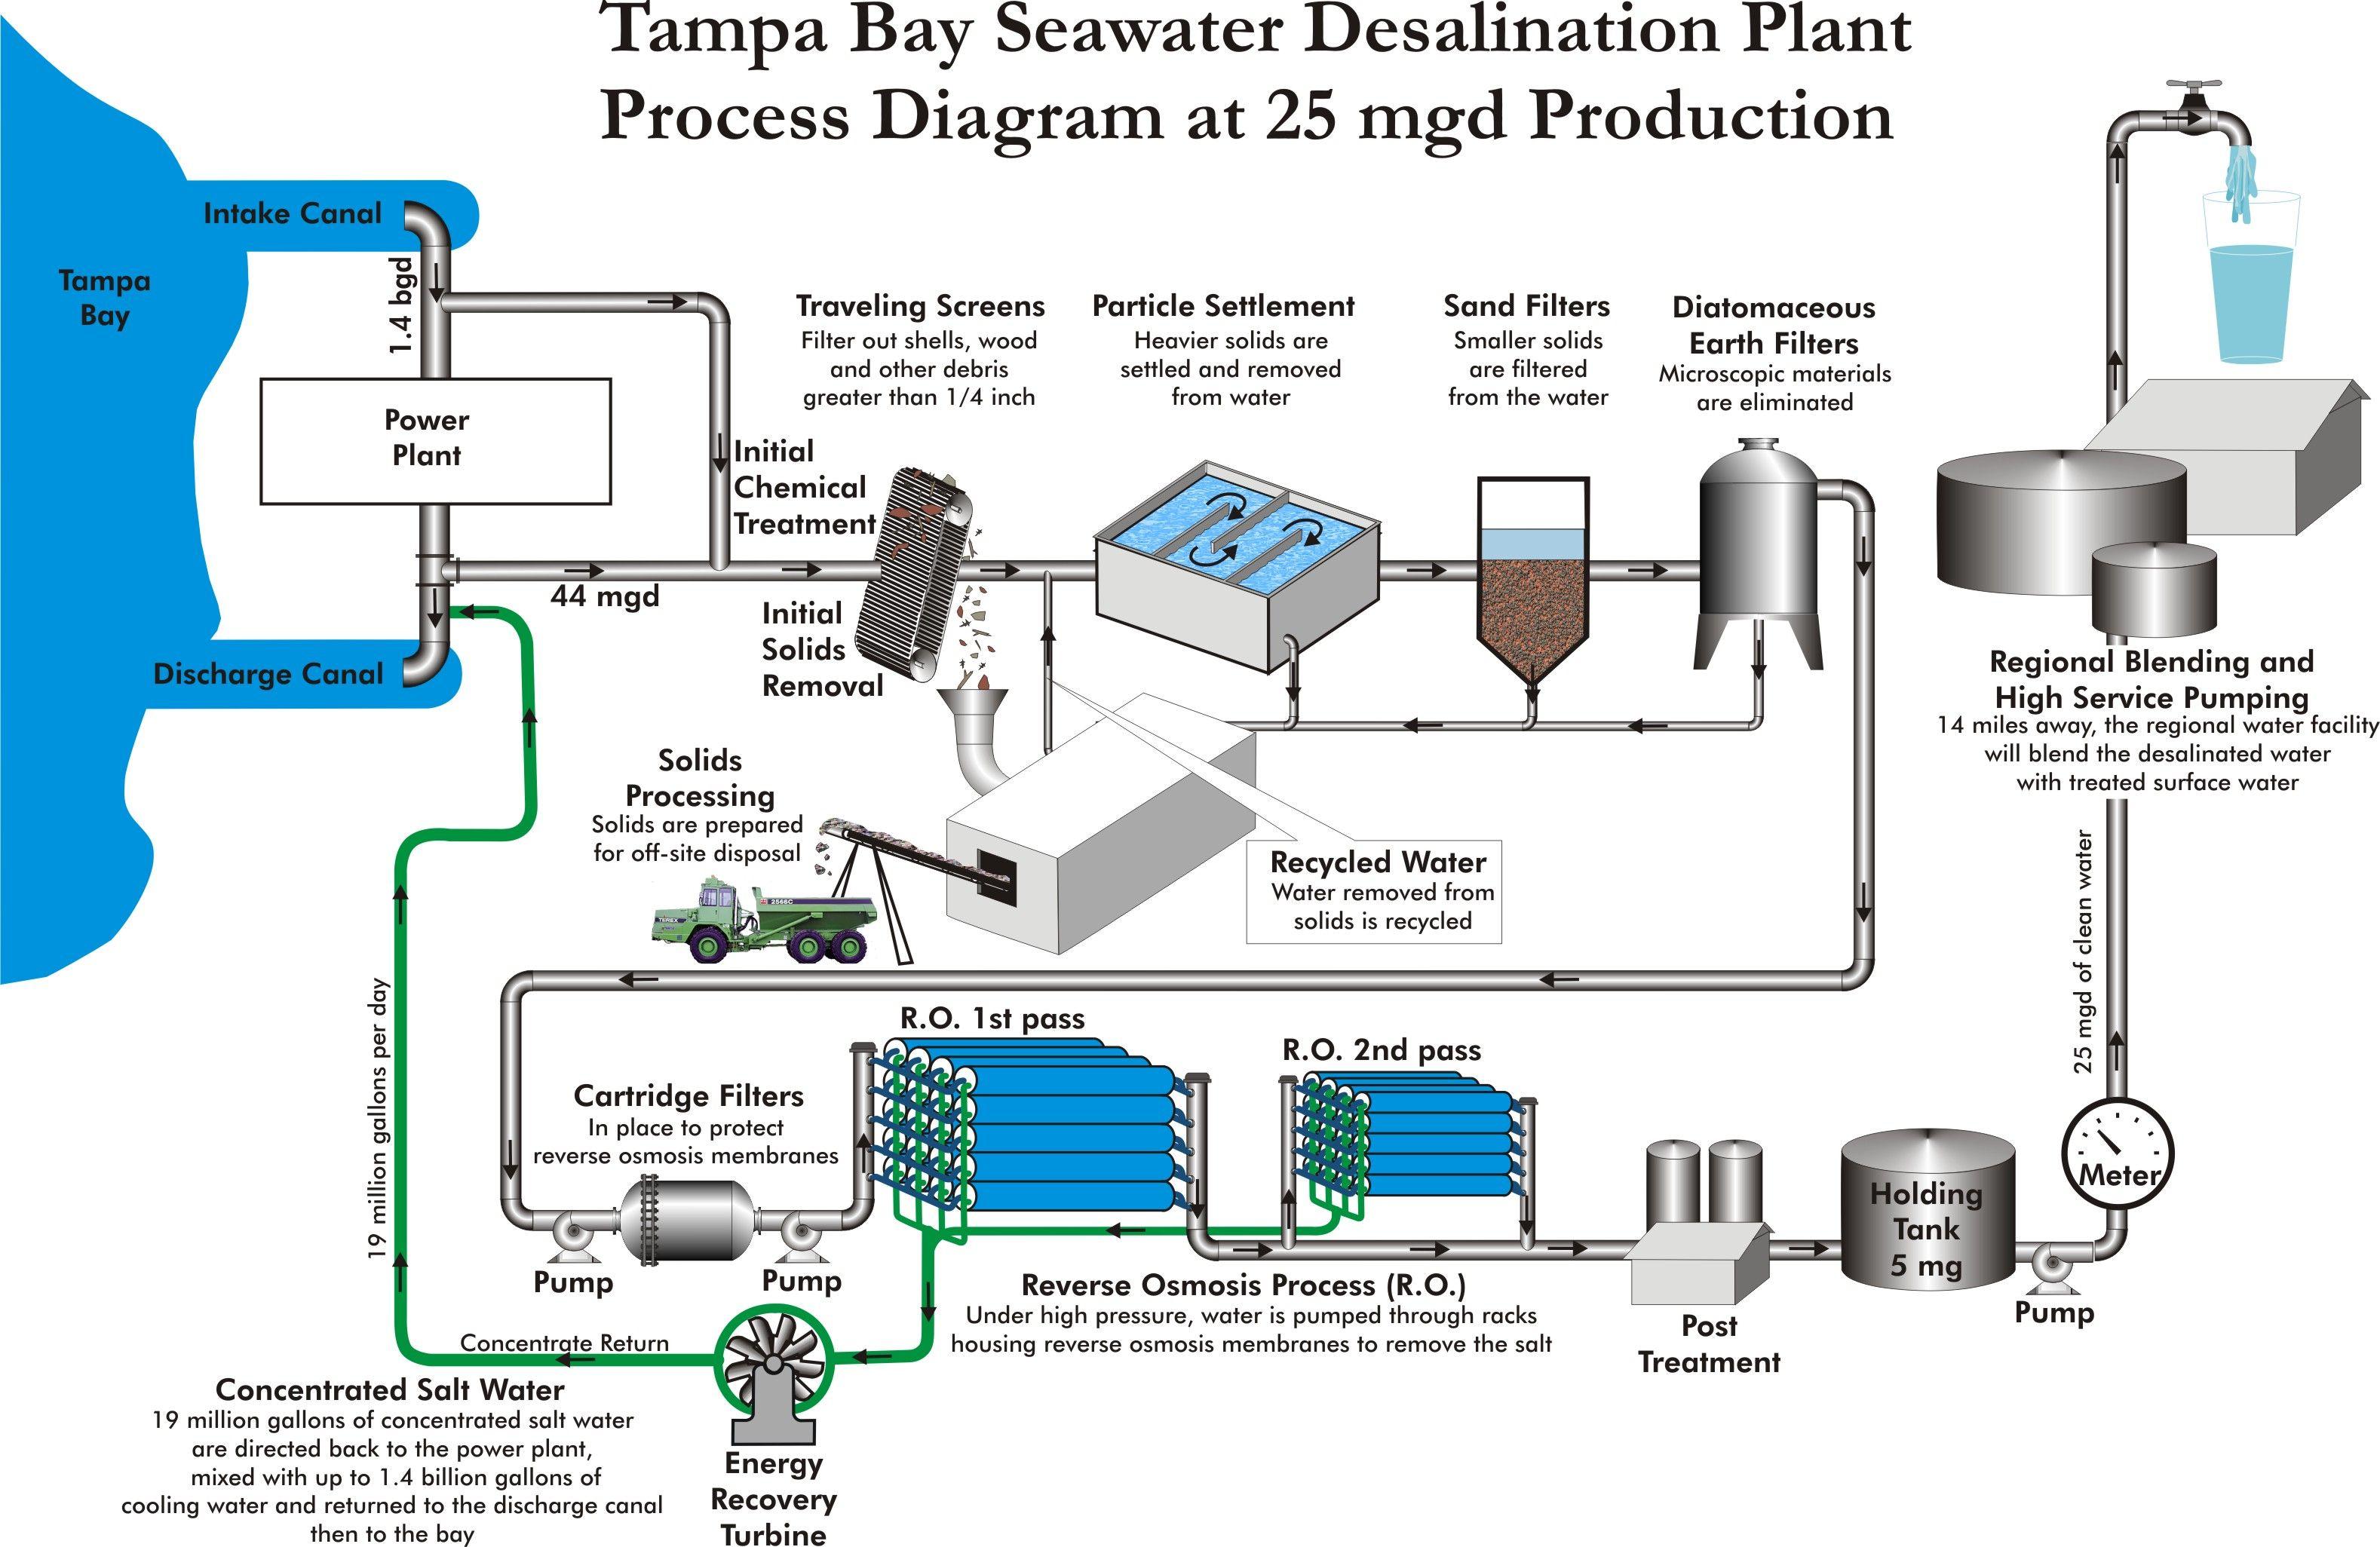 medium resolution of tampa bay seawater desalination plant flow diagram